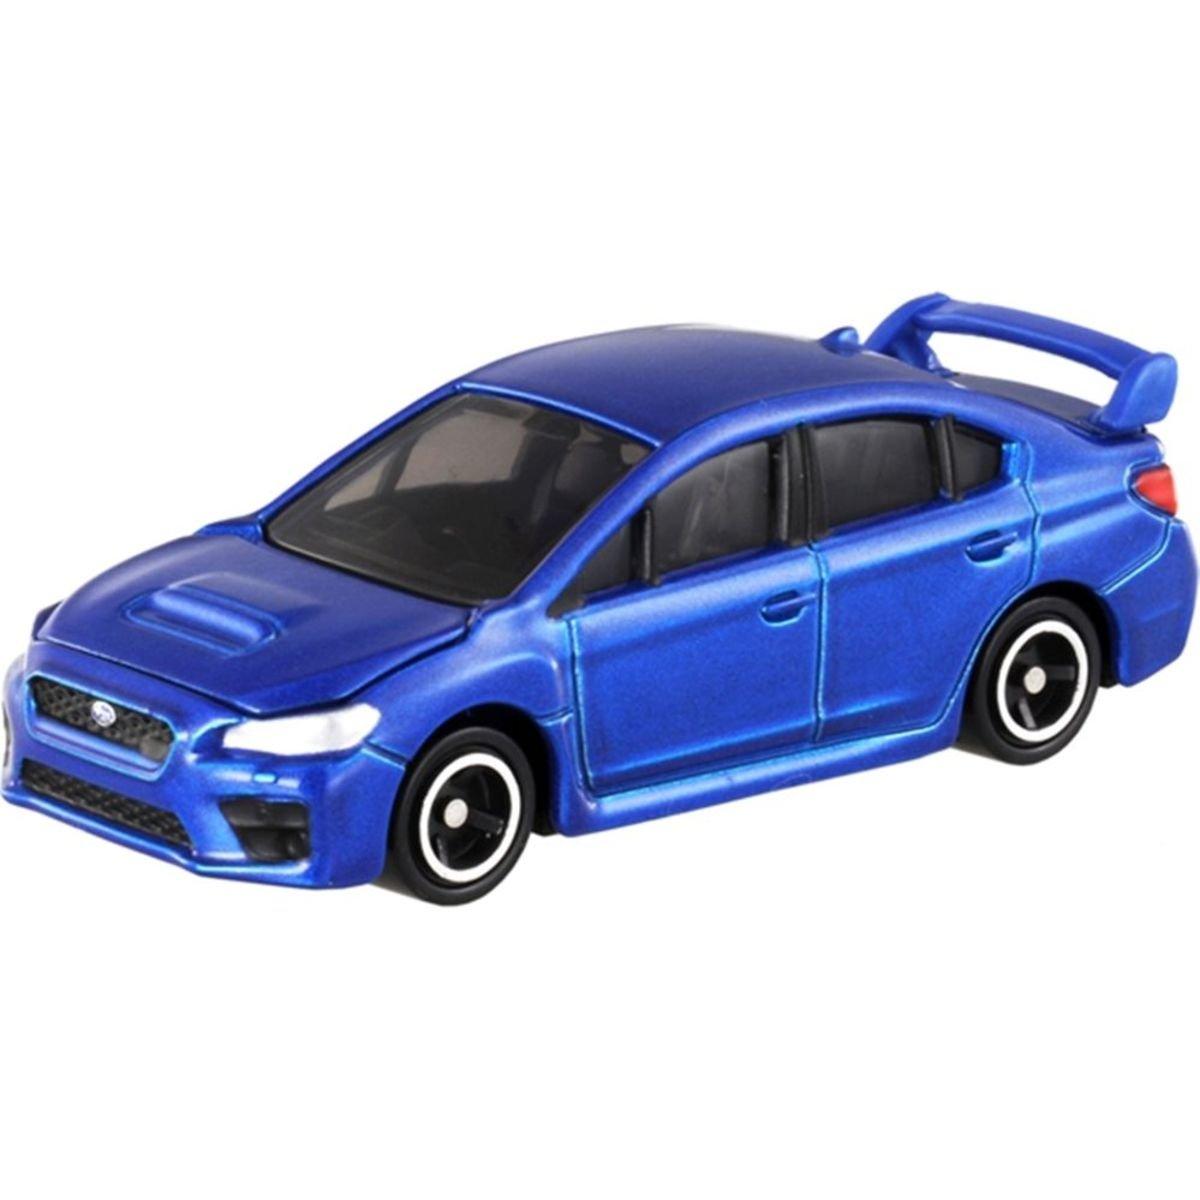 Tomy 112 Subaru WRX STI Type S Blue 1/62